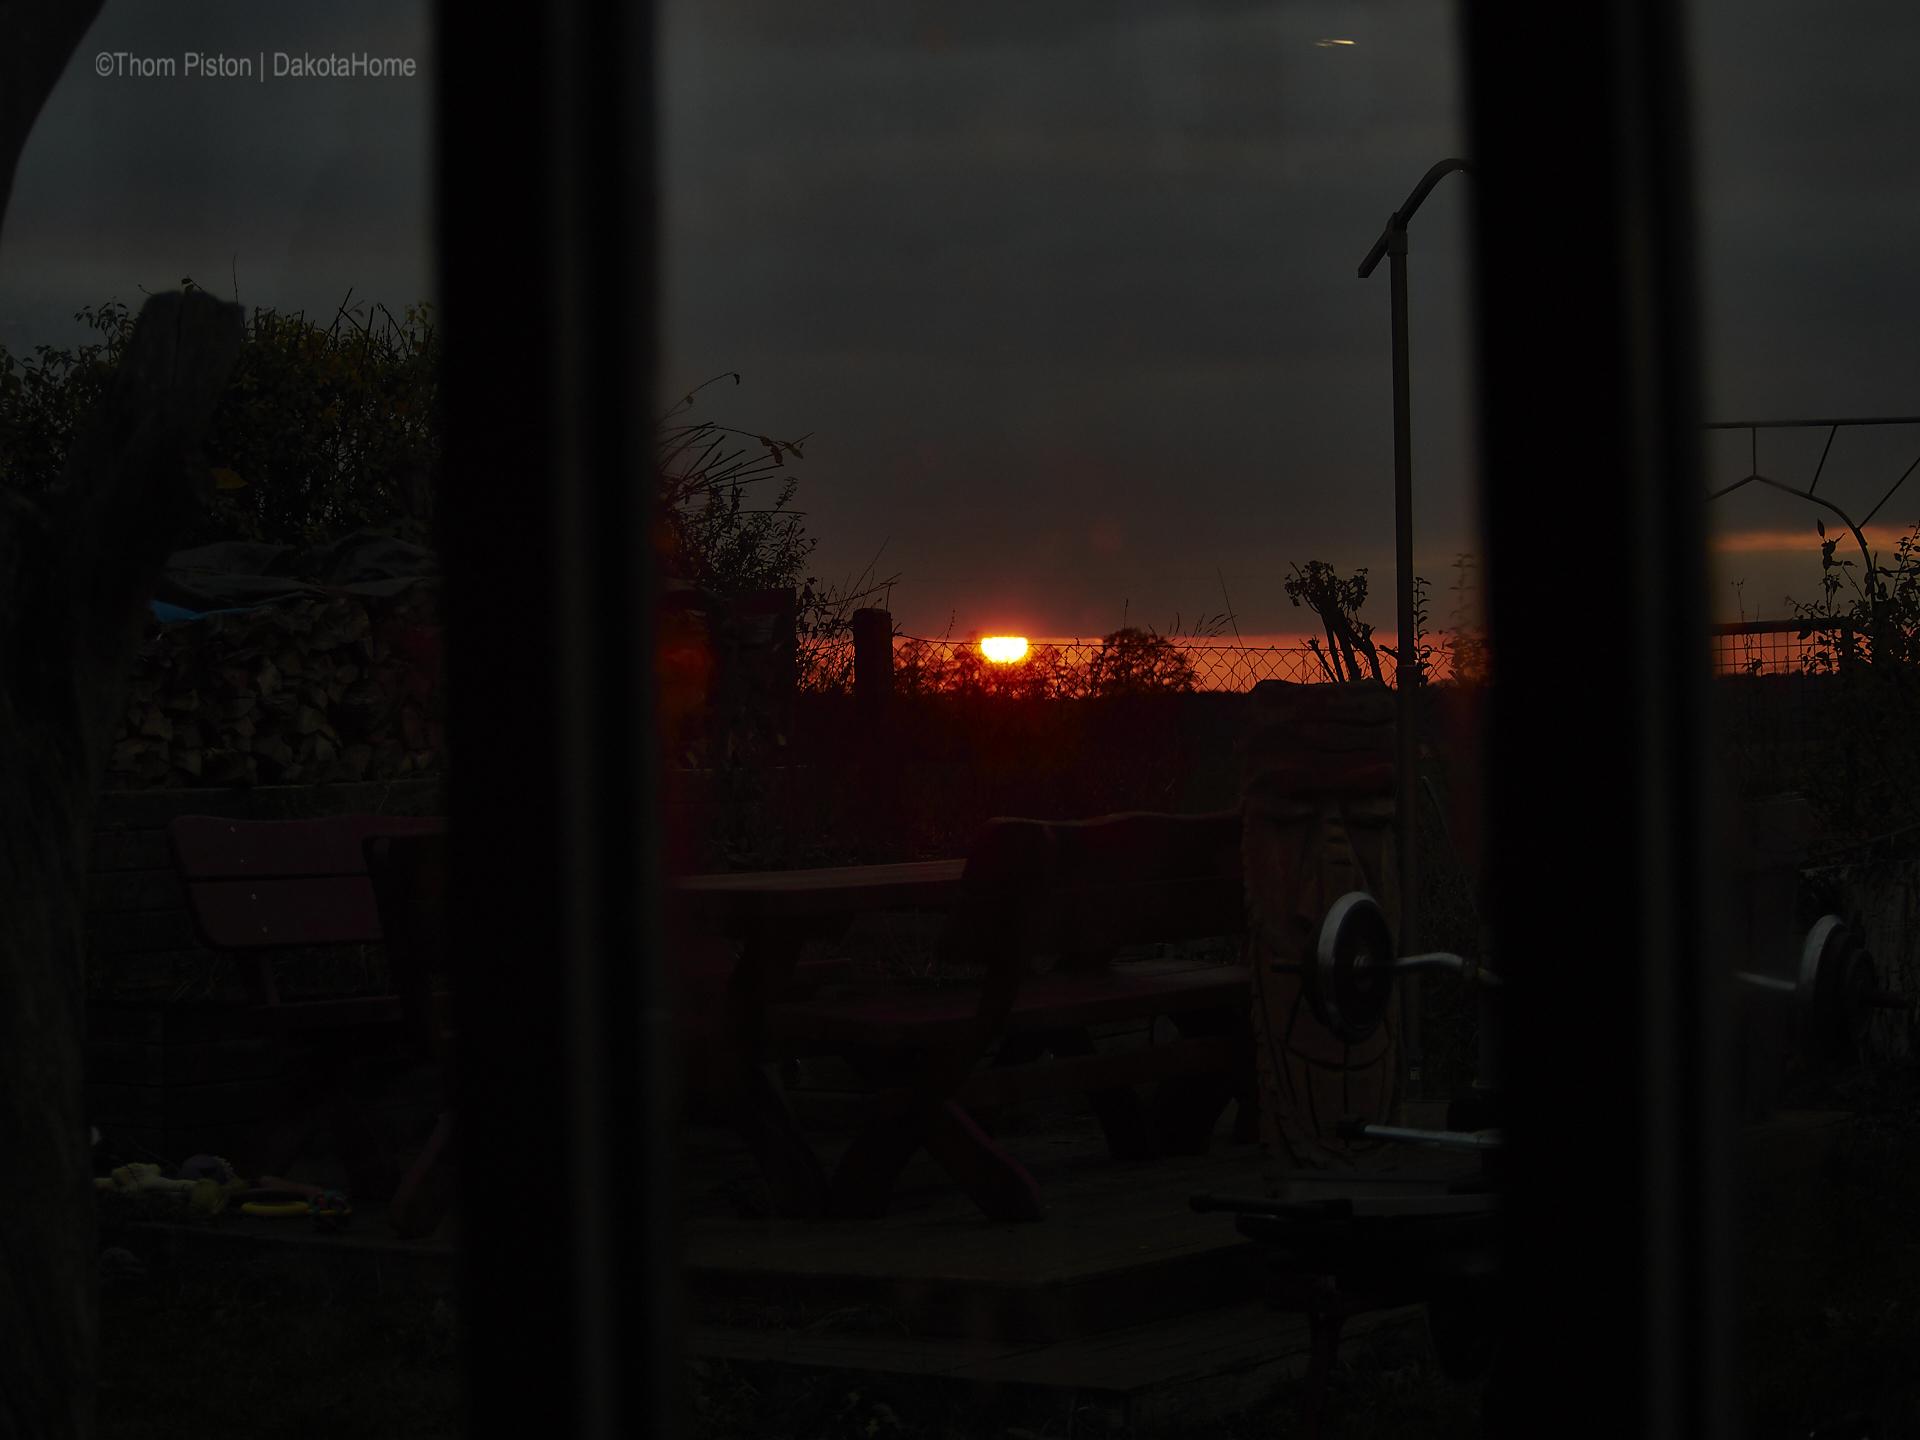 sonnenuntergang mitte november dakota home